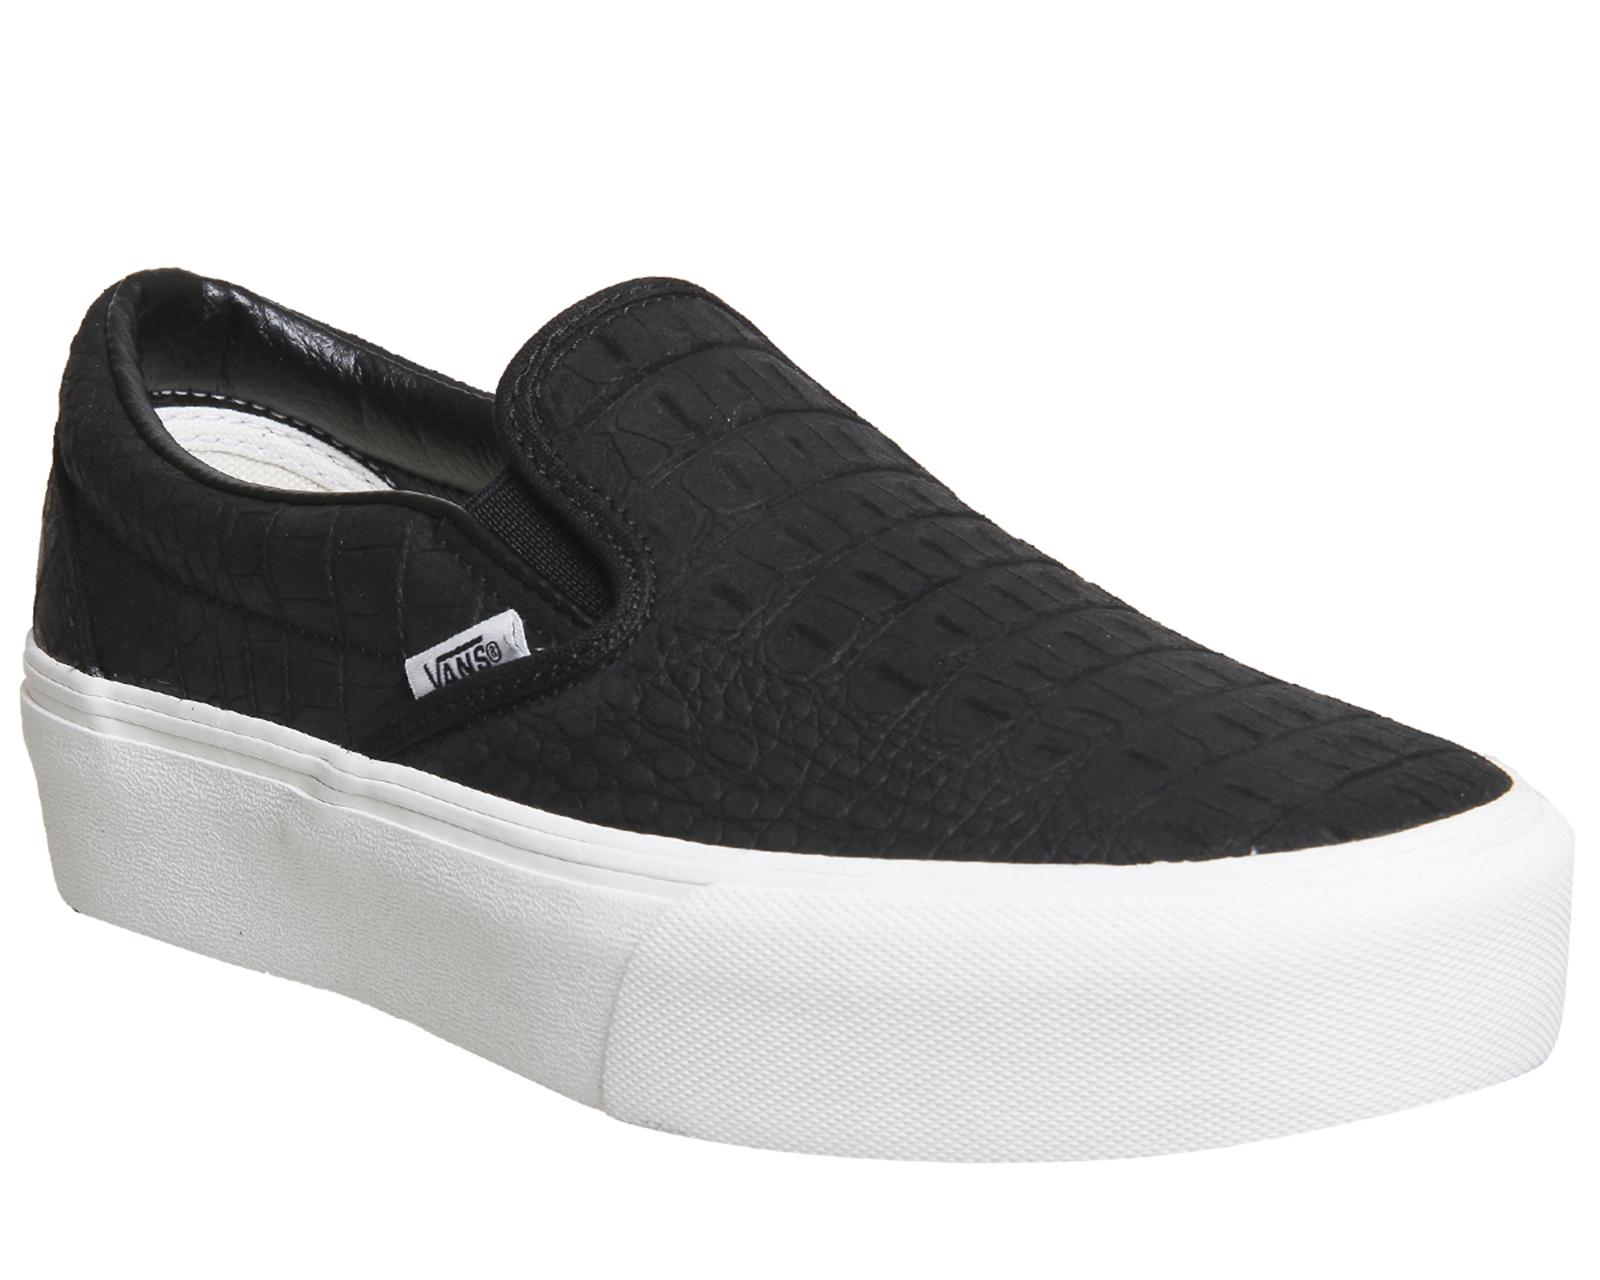 8eab715db552 Sentinel Womens Vans Slip On Platform Trainers EMBOSSED BLACK WHITE Trainers  Shoes